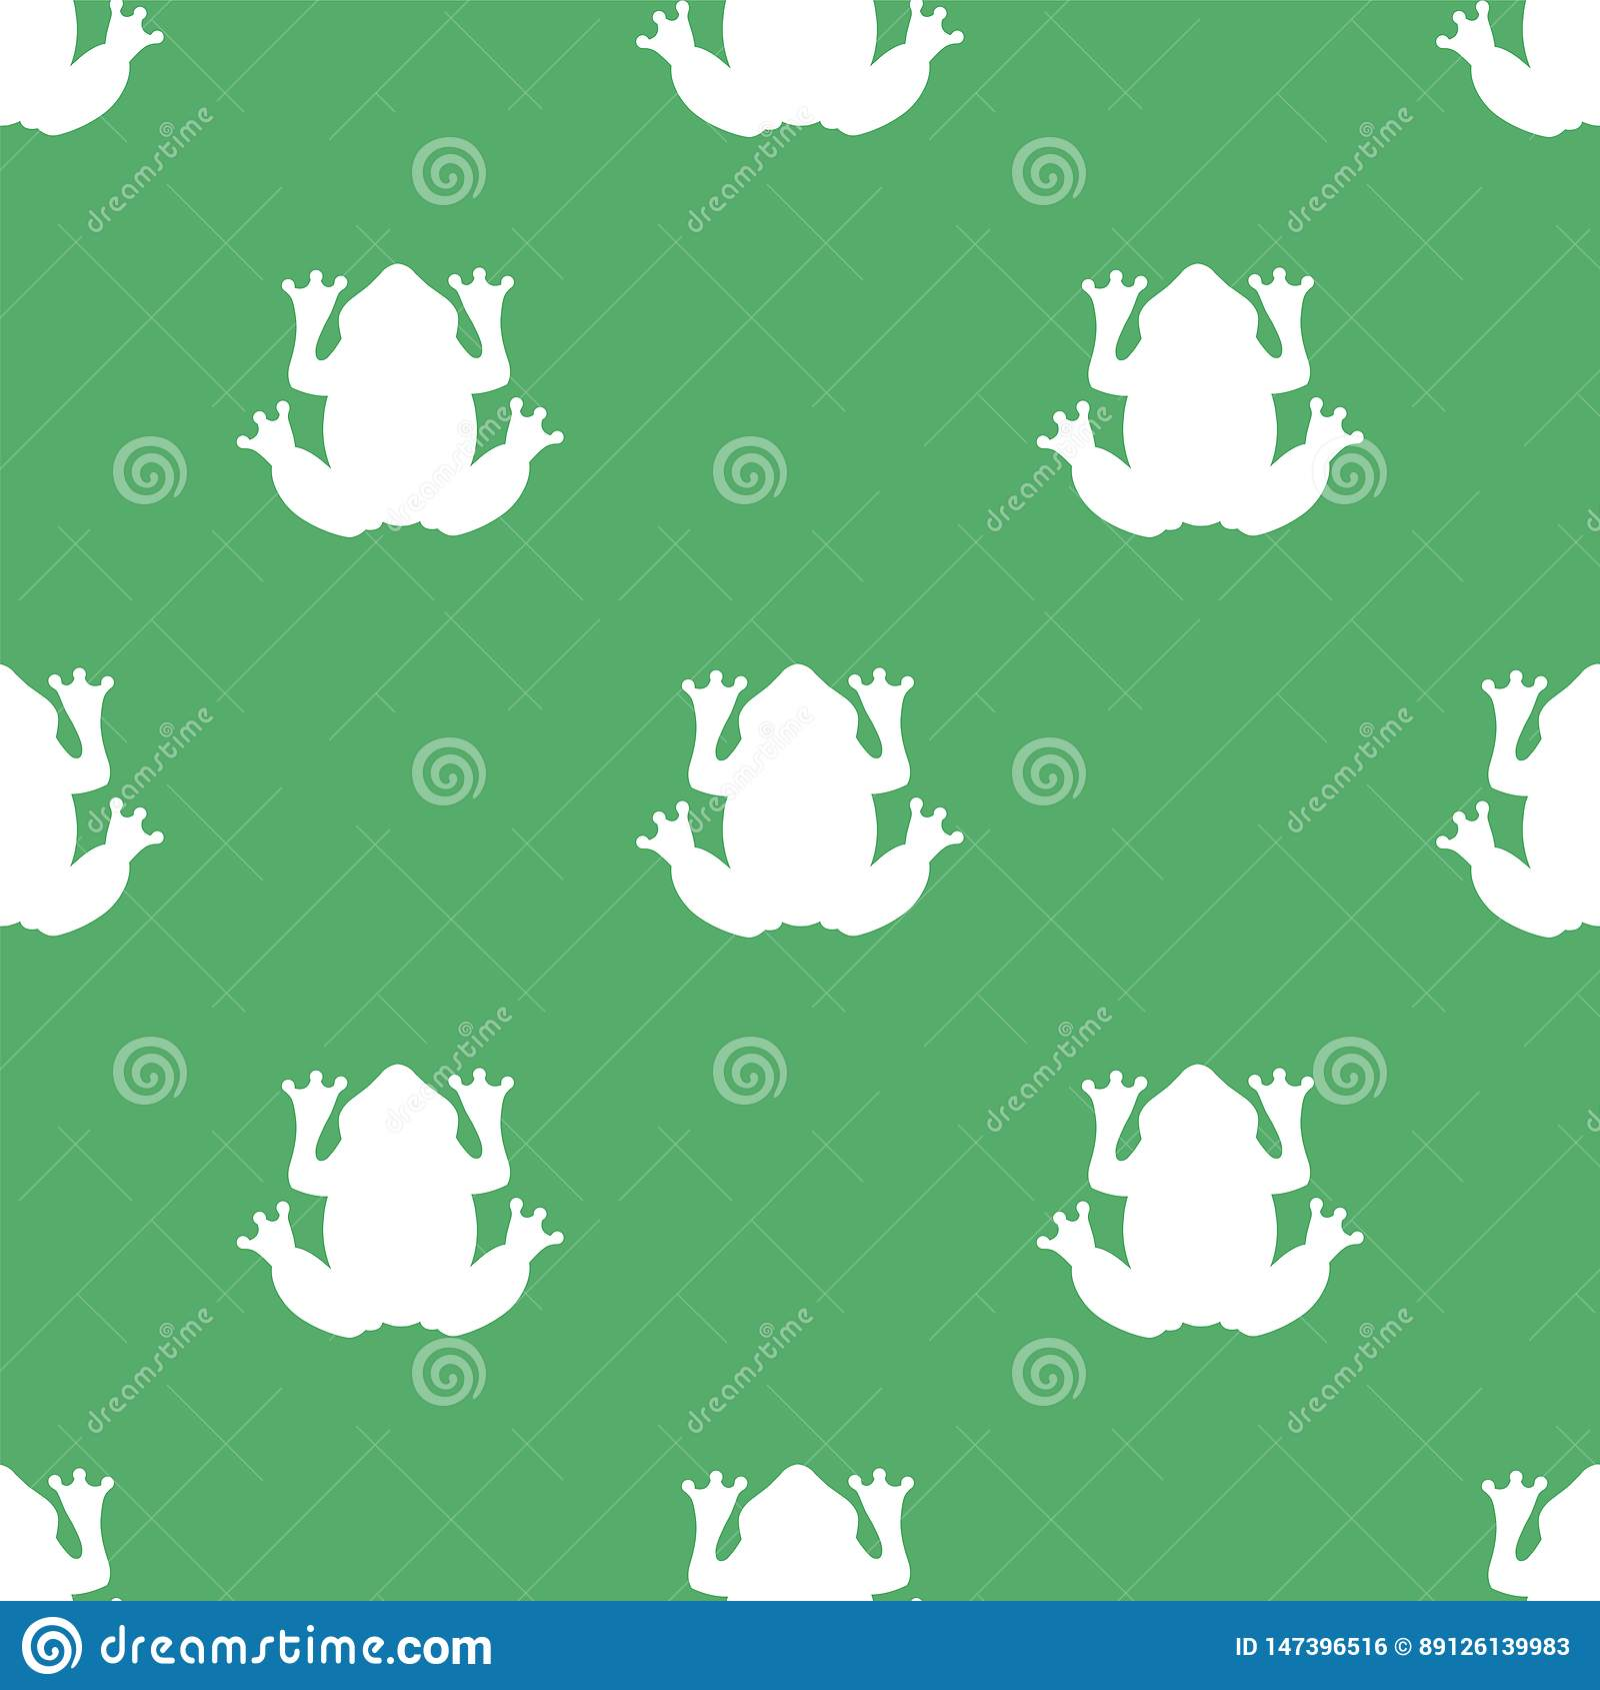 Siluetta di una rana bianca su un fondo verde